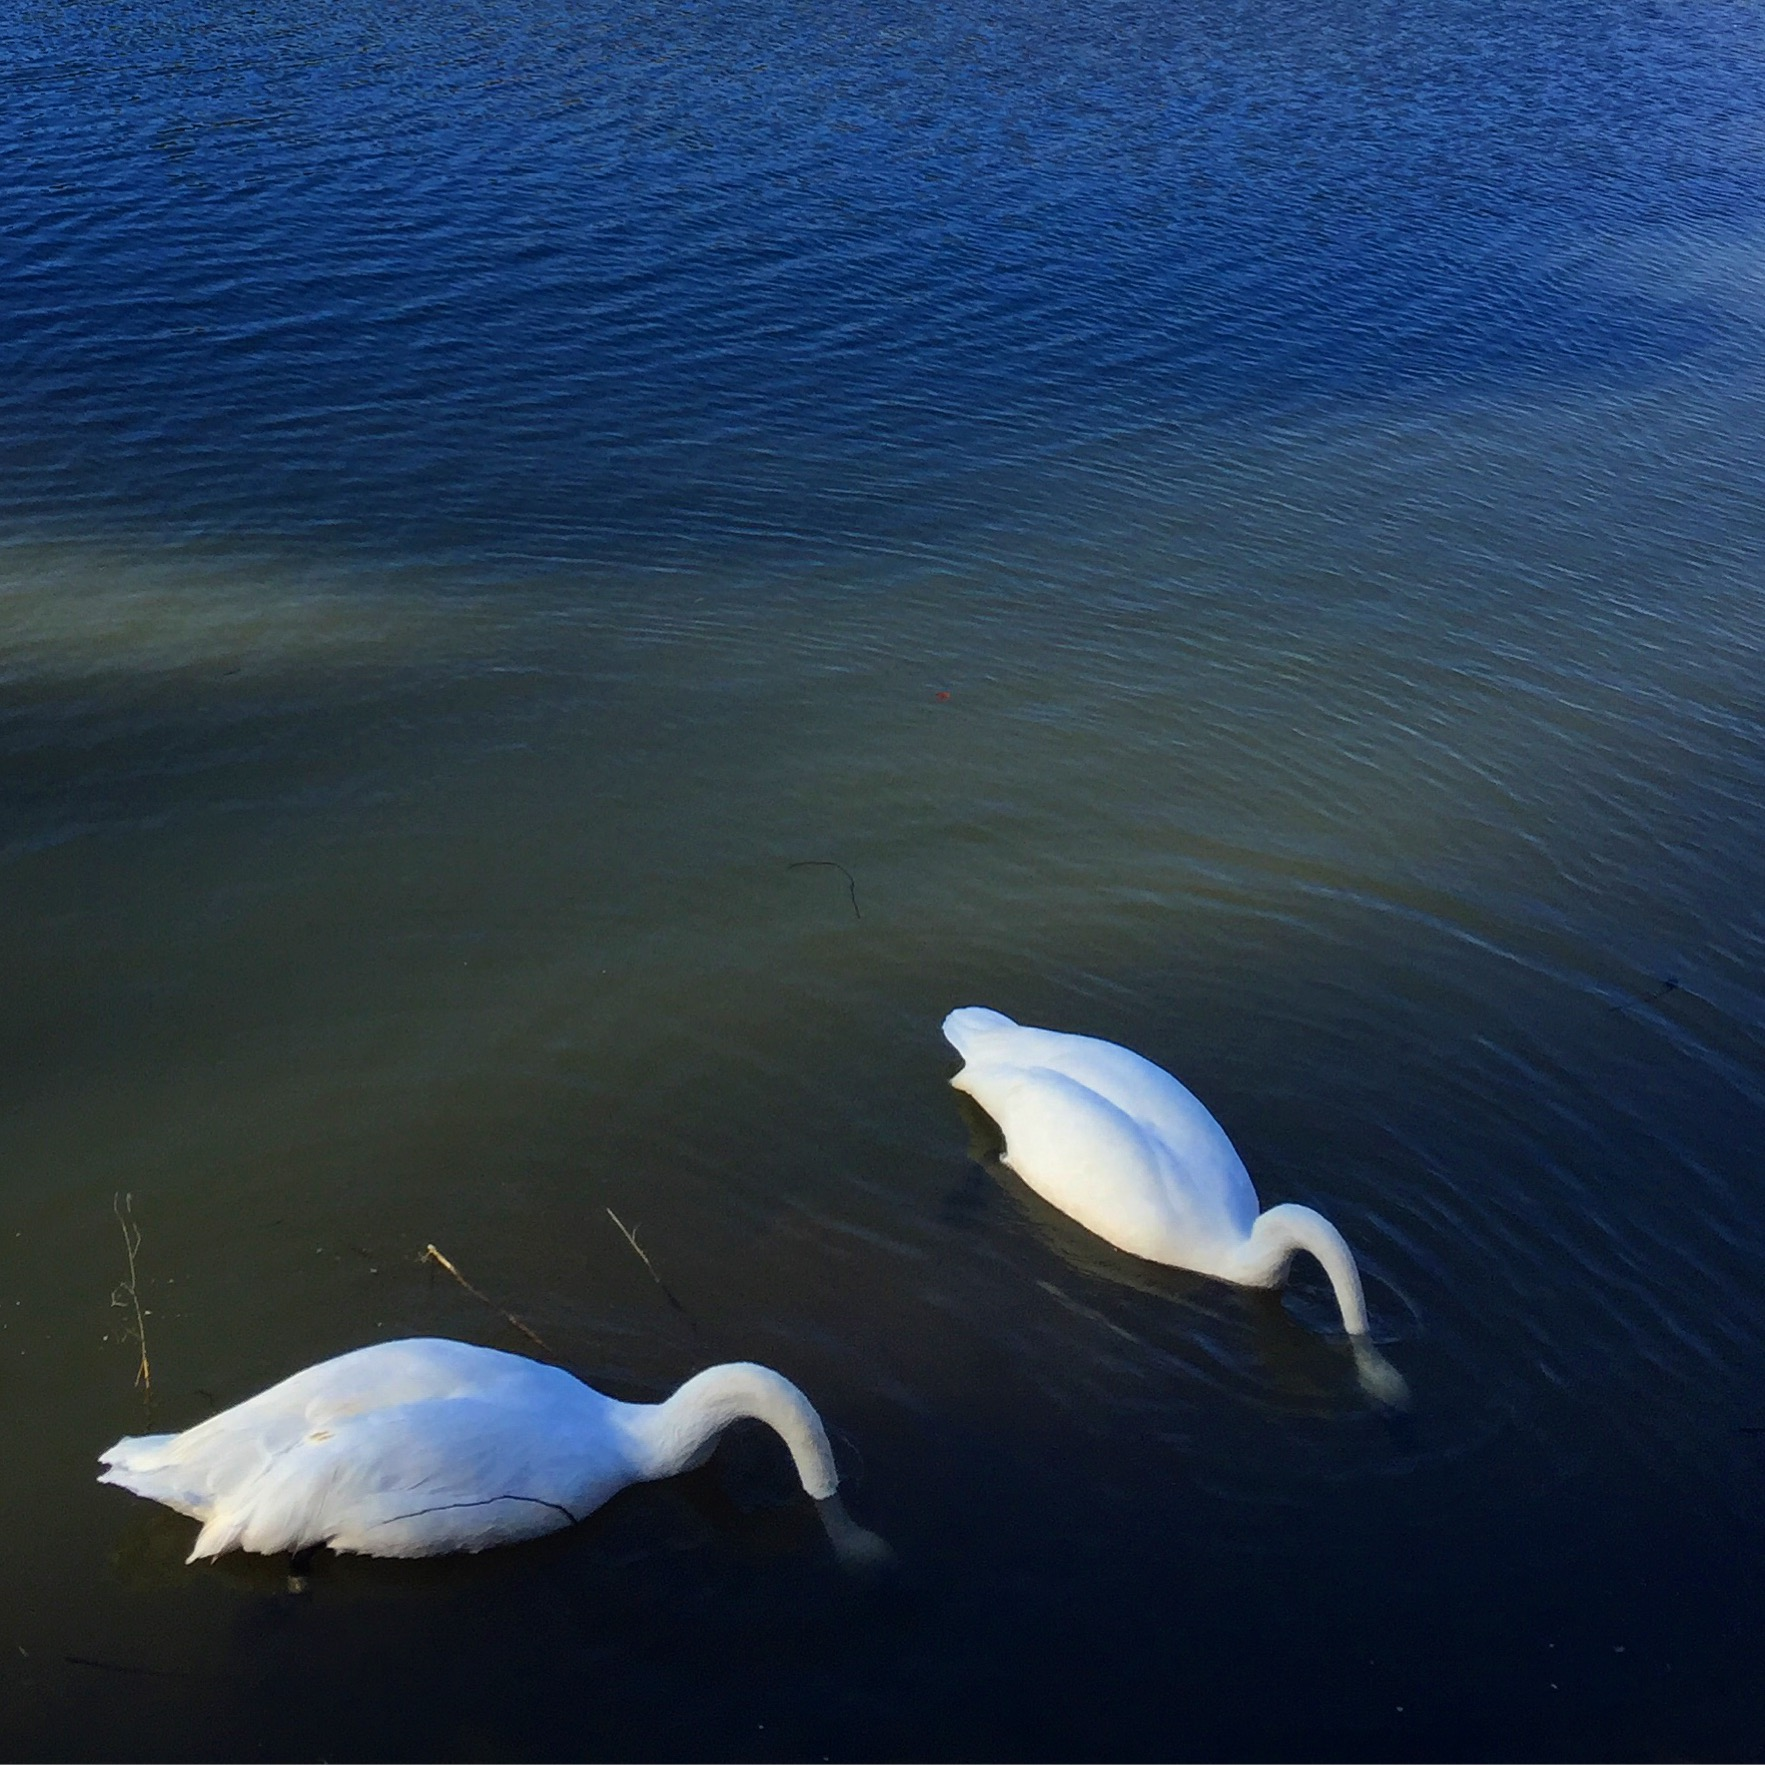 Swans on Star Lake, Birmingham.